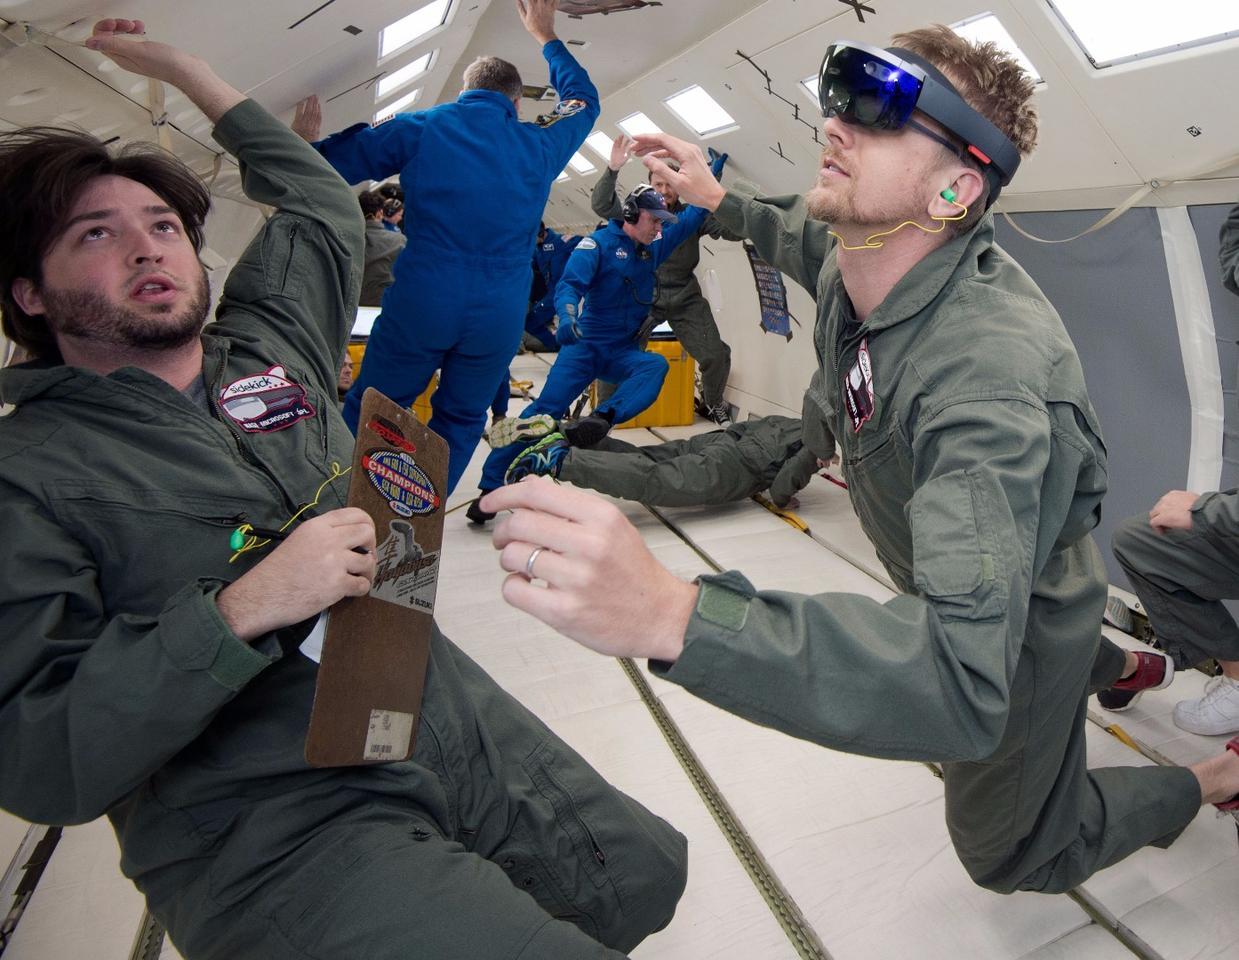 NASA and Microsoft engineers test Project Sidekick on NASA's Weightless Wonder C9 jet